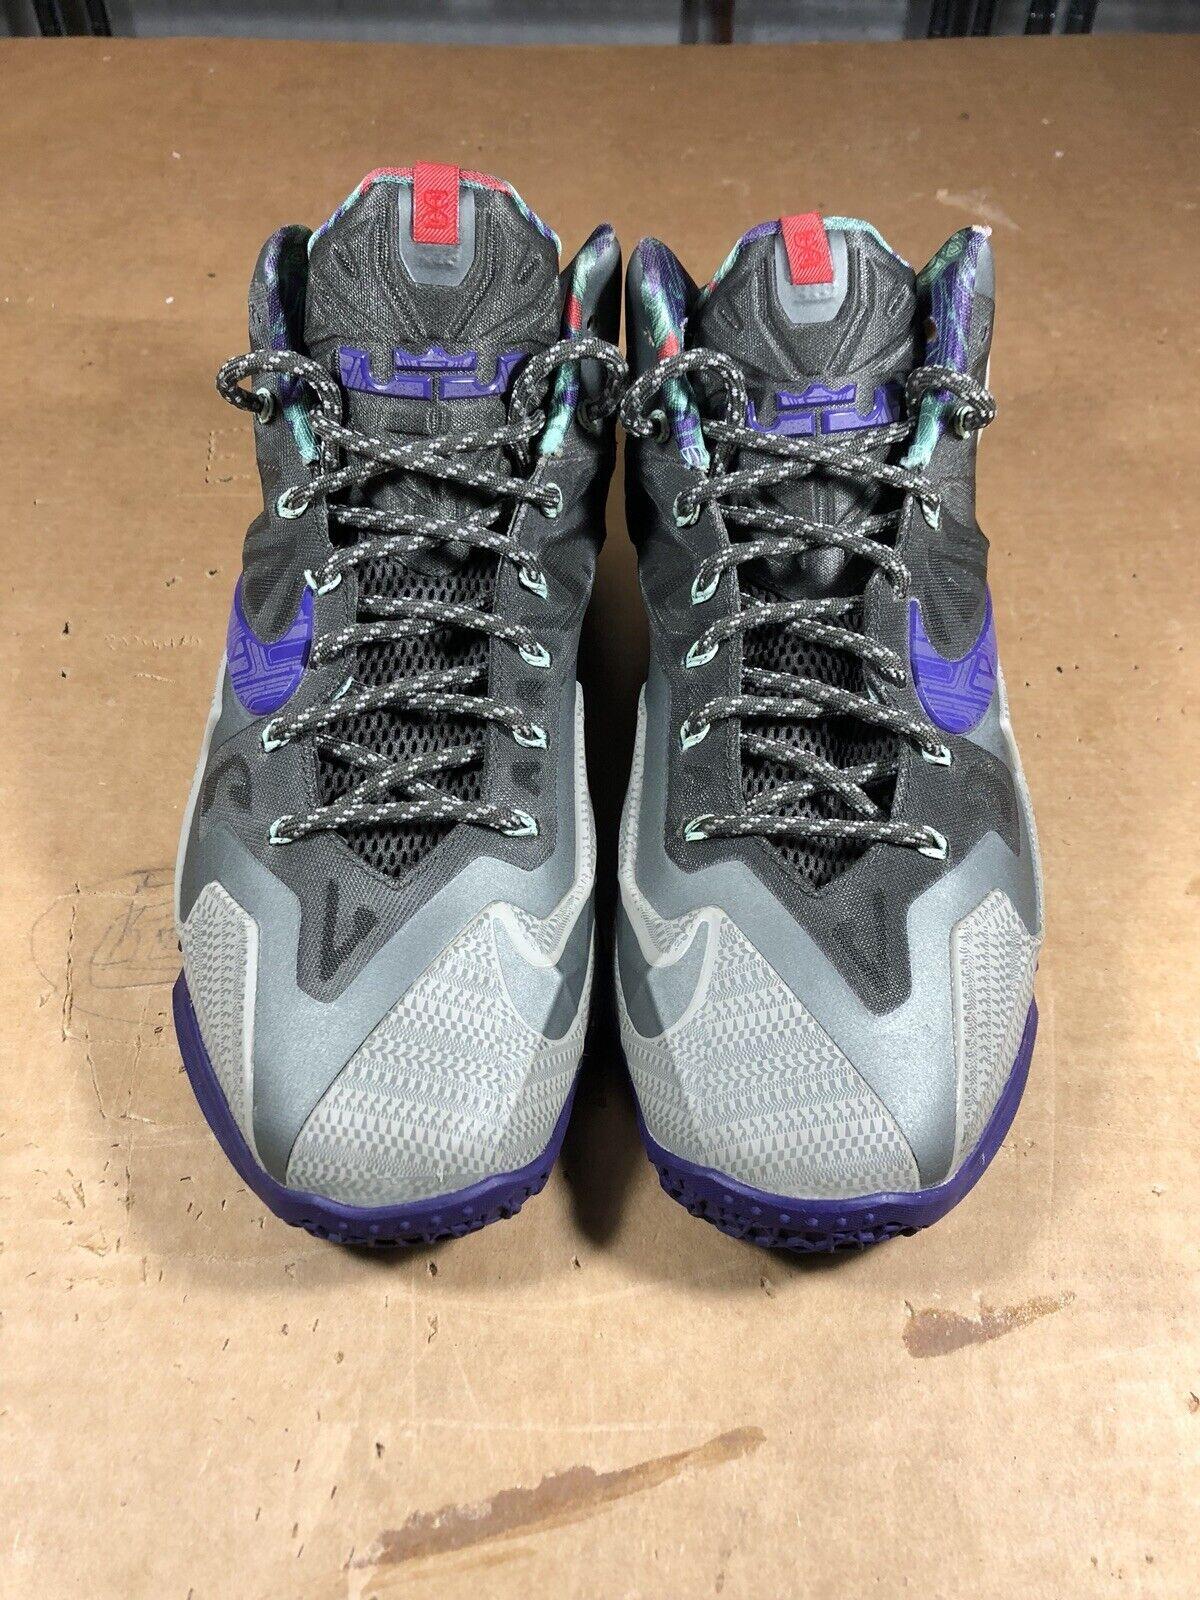 100% Authentic Nike Lebron 11 Terracotta Warrior Size 11.5 616175 005